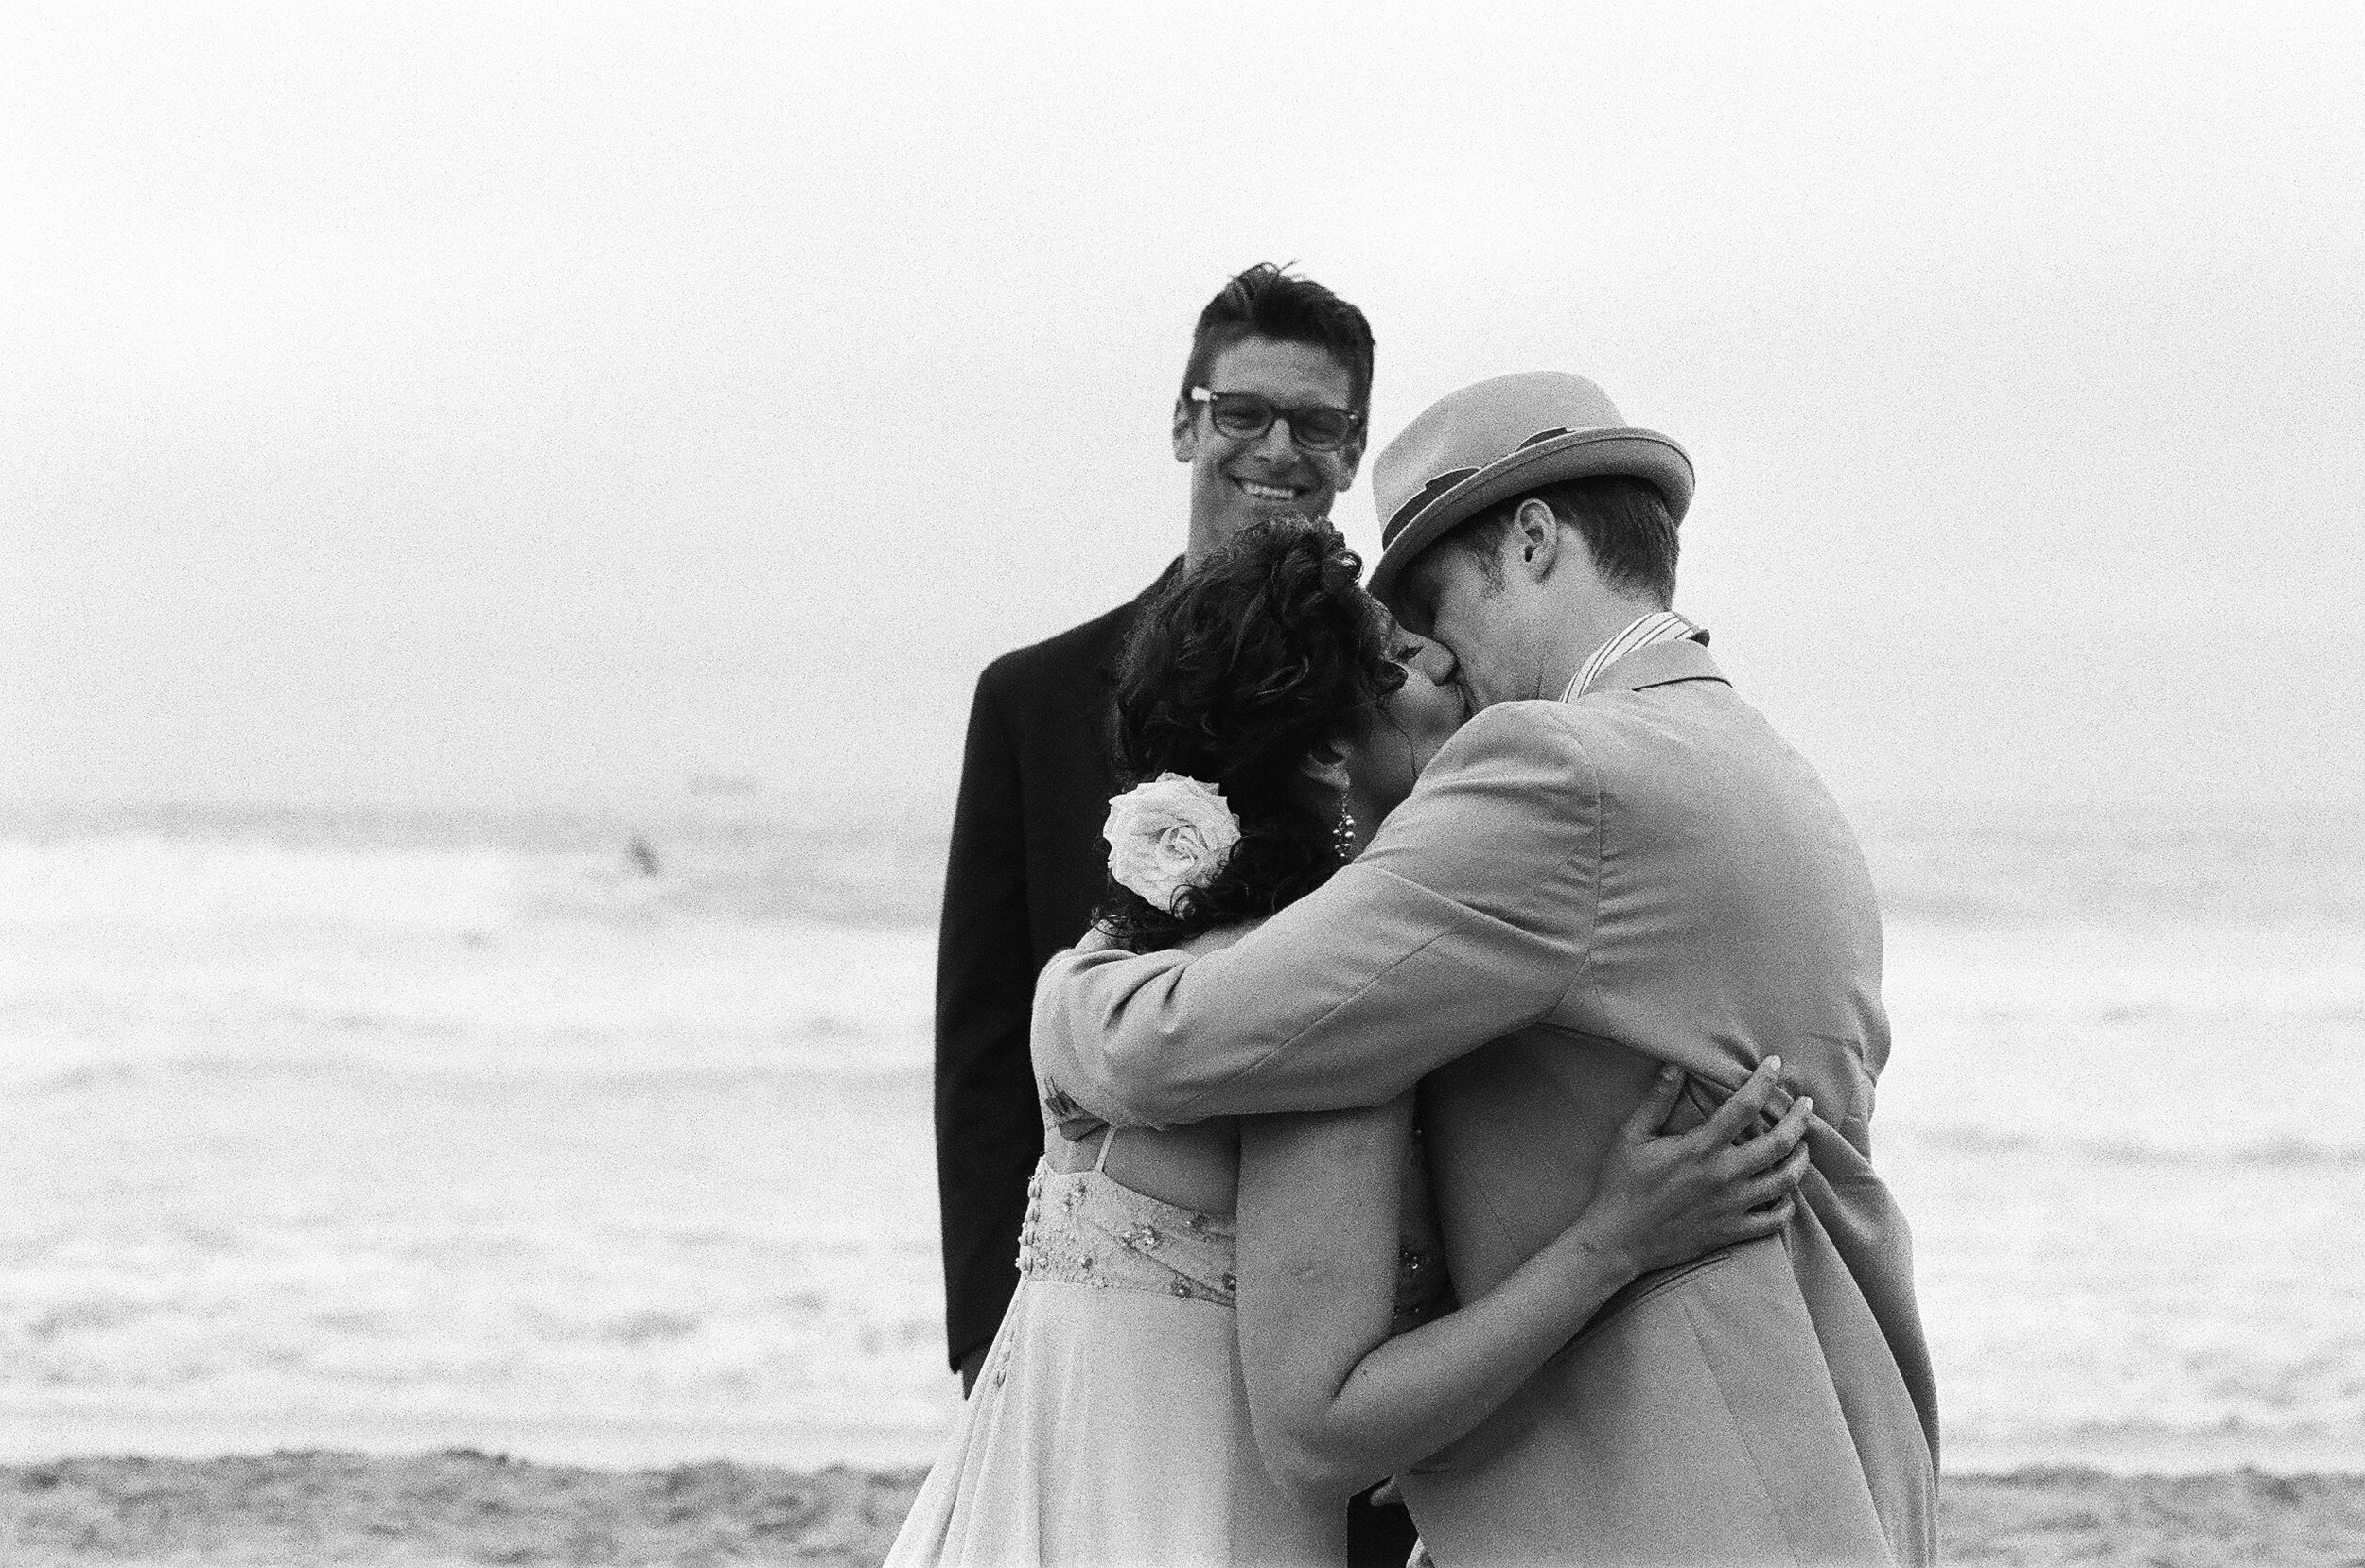 We were married on SF Ocean Beach on July 27, 2013.